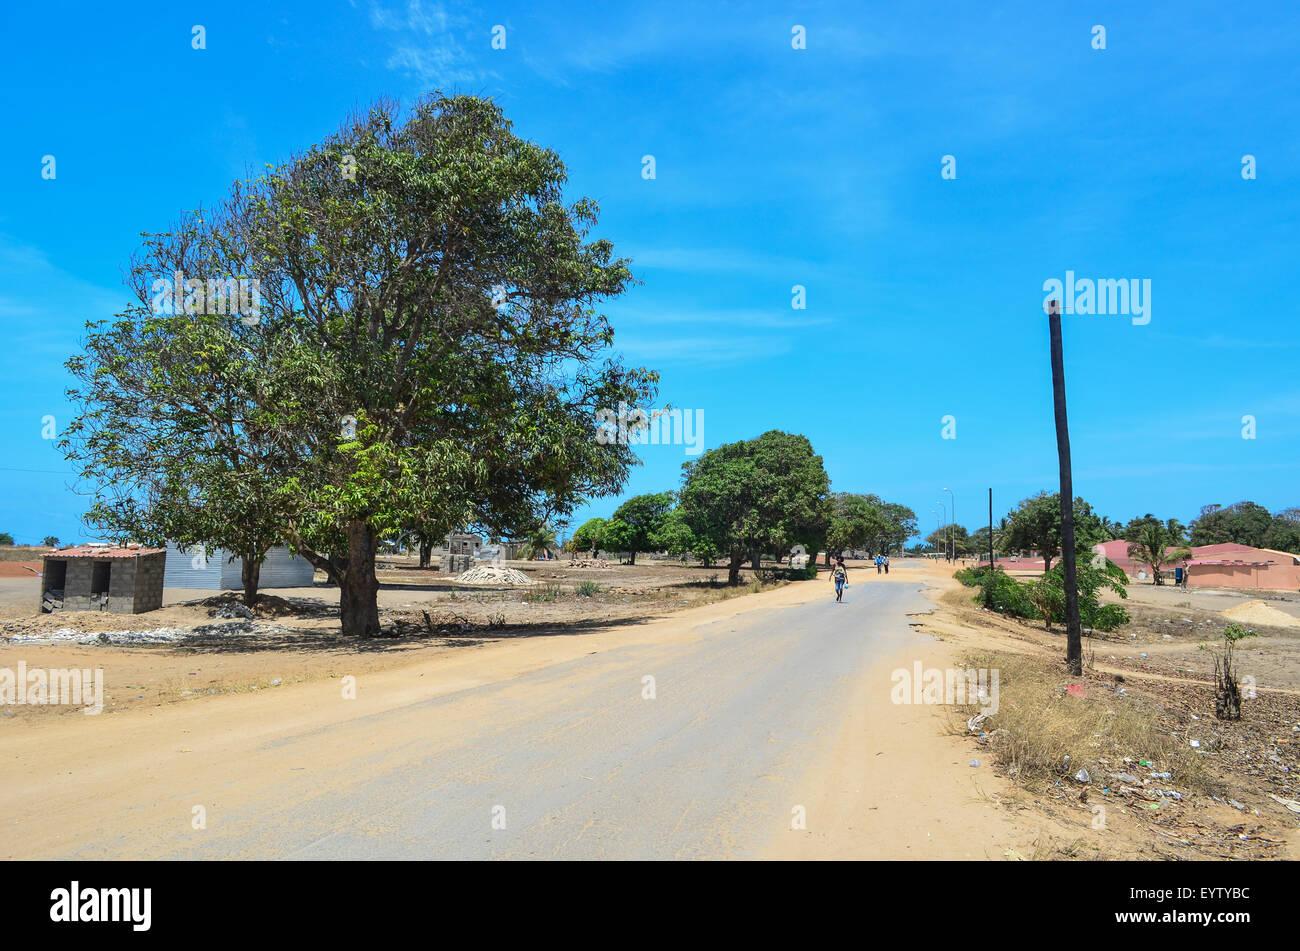 Town of Ambriz, Angola - Stock Image